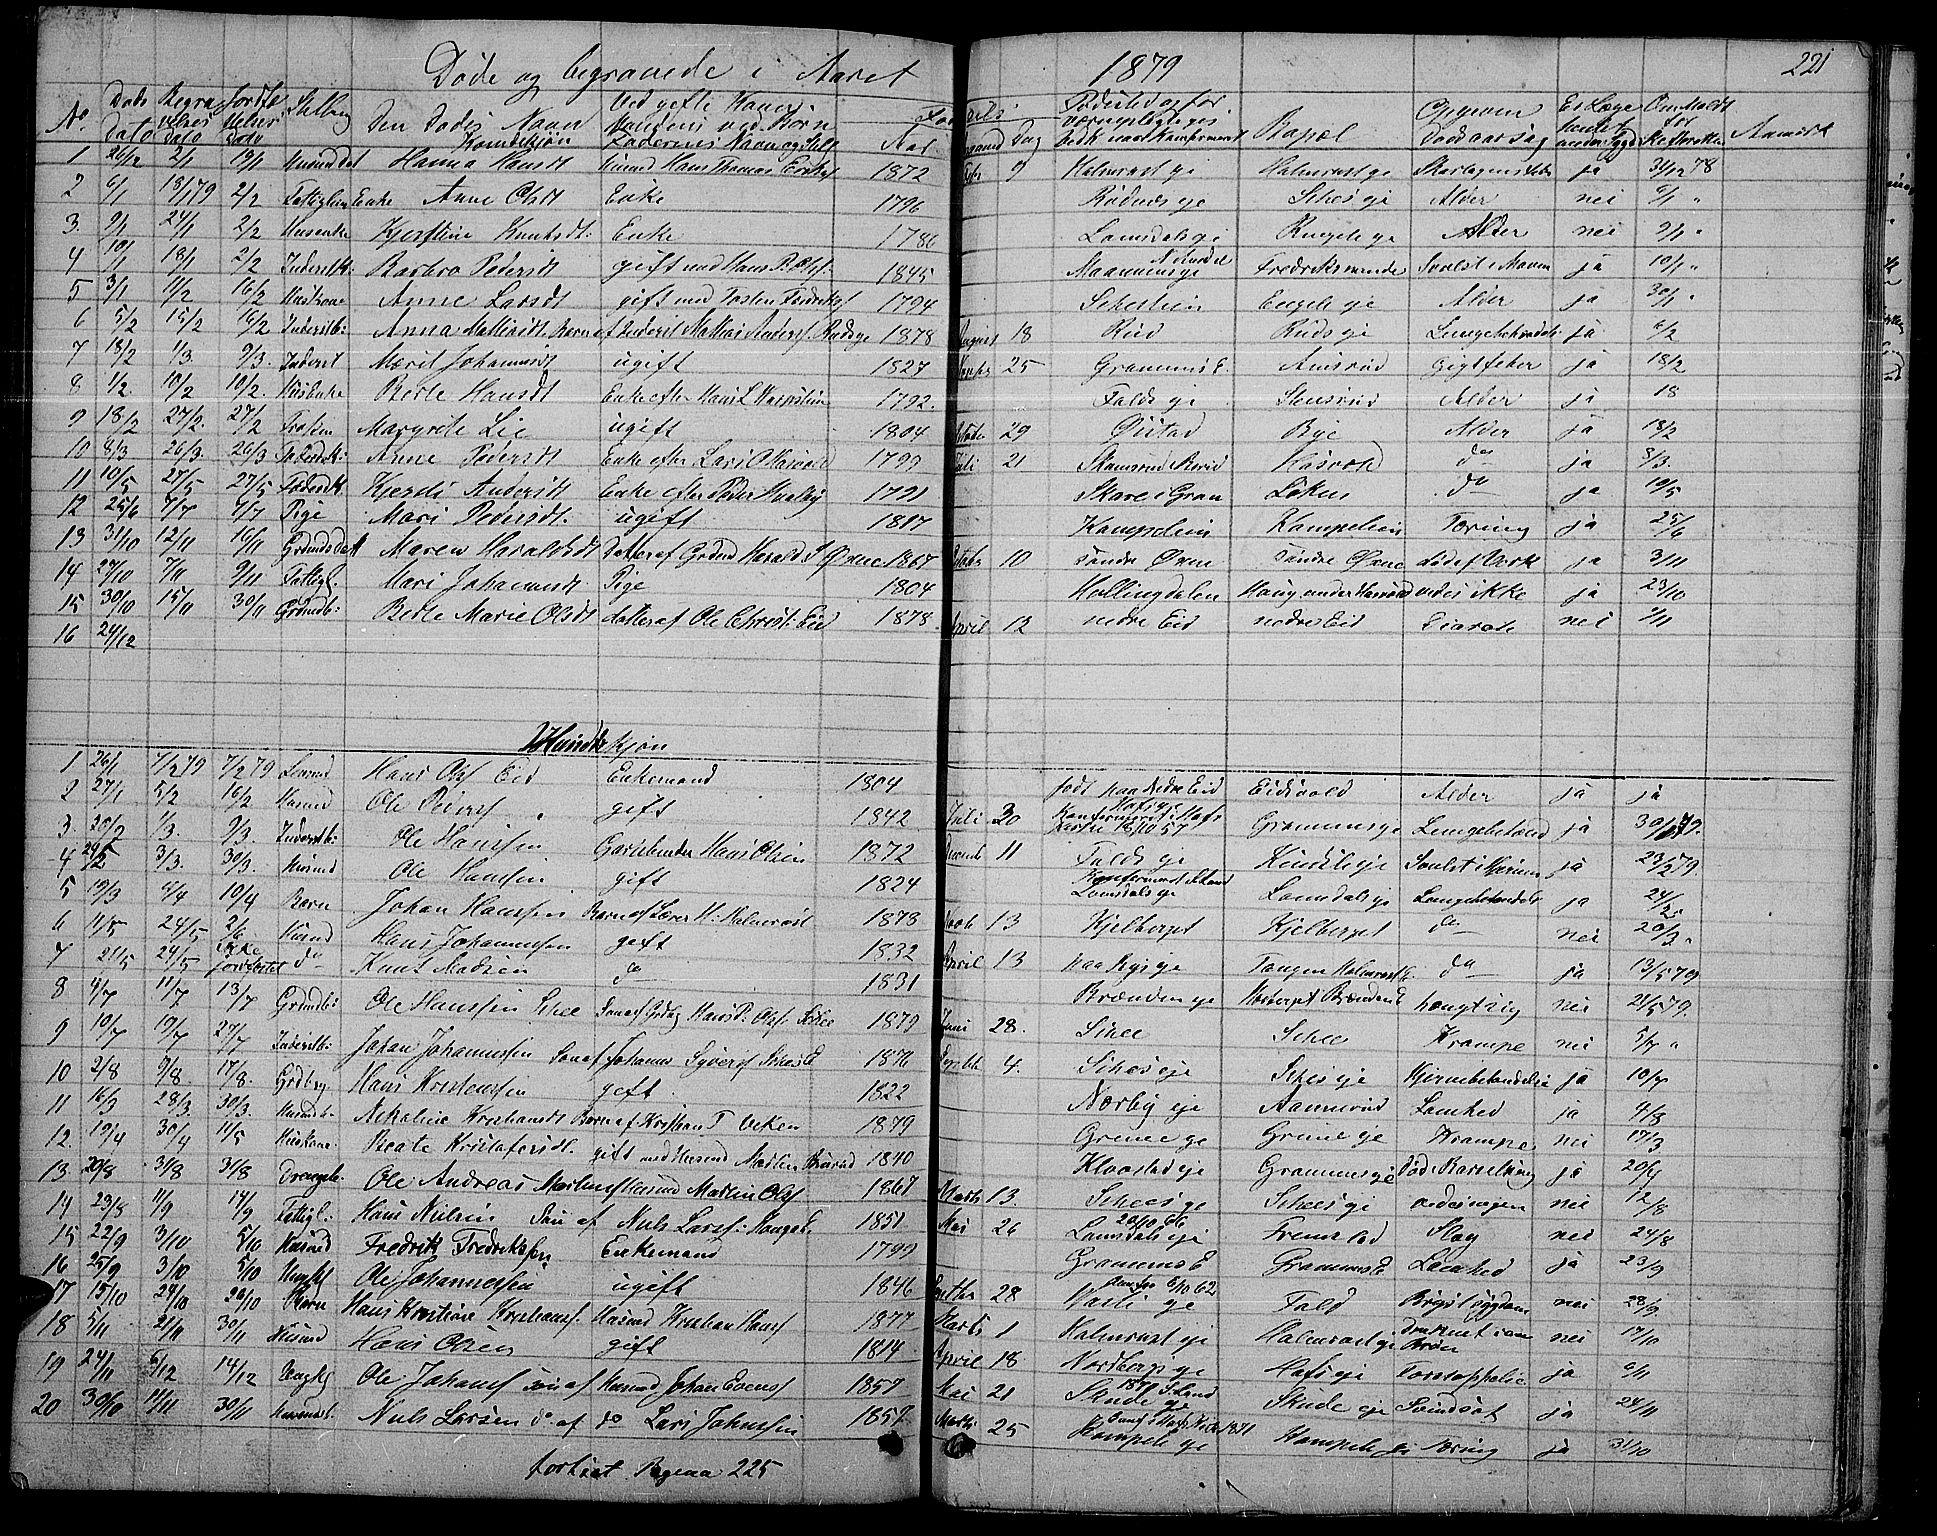 SAH, Søndre Land prestekontor, L/L0001: Klokkerbok nr. 1, 1849-1883, s. 221